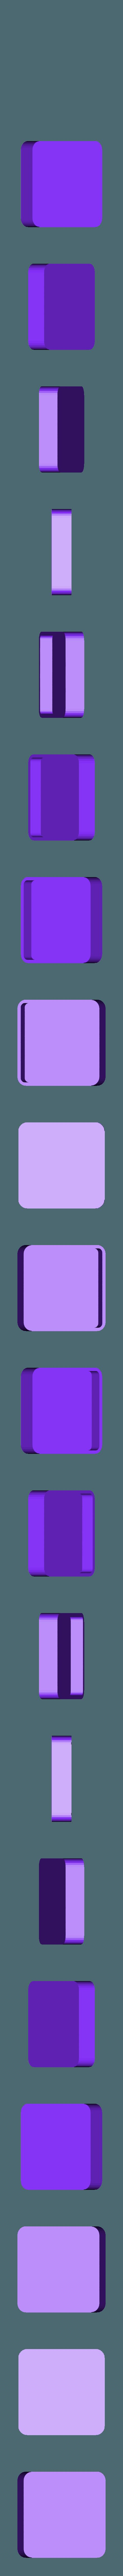 Boite-20x20x40-Dessus.stl Download STL file Storage box for model making 20 x 20 x 40 millimetres • 3D printable design, Almisuifre